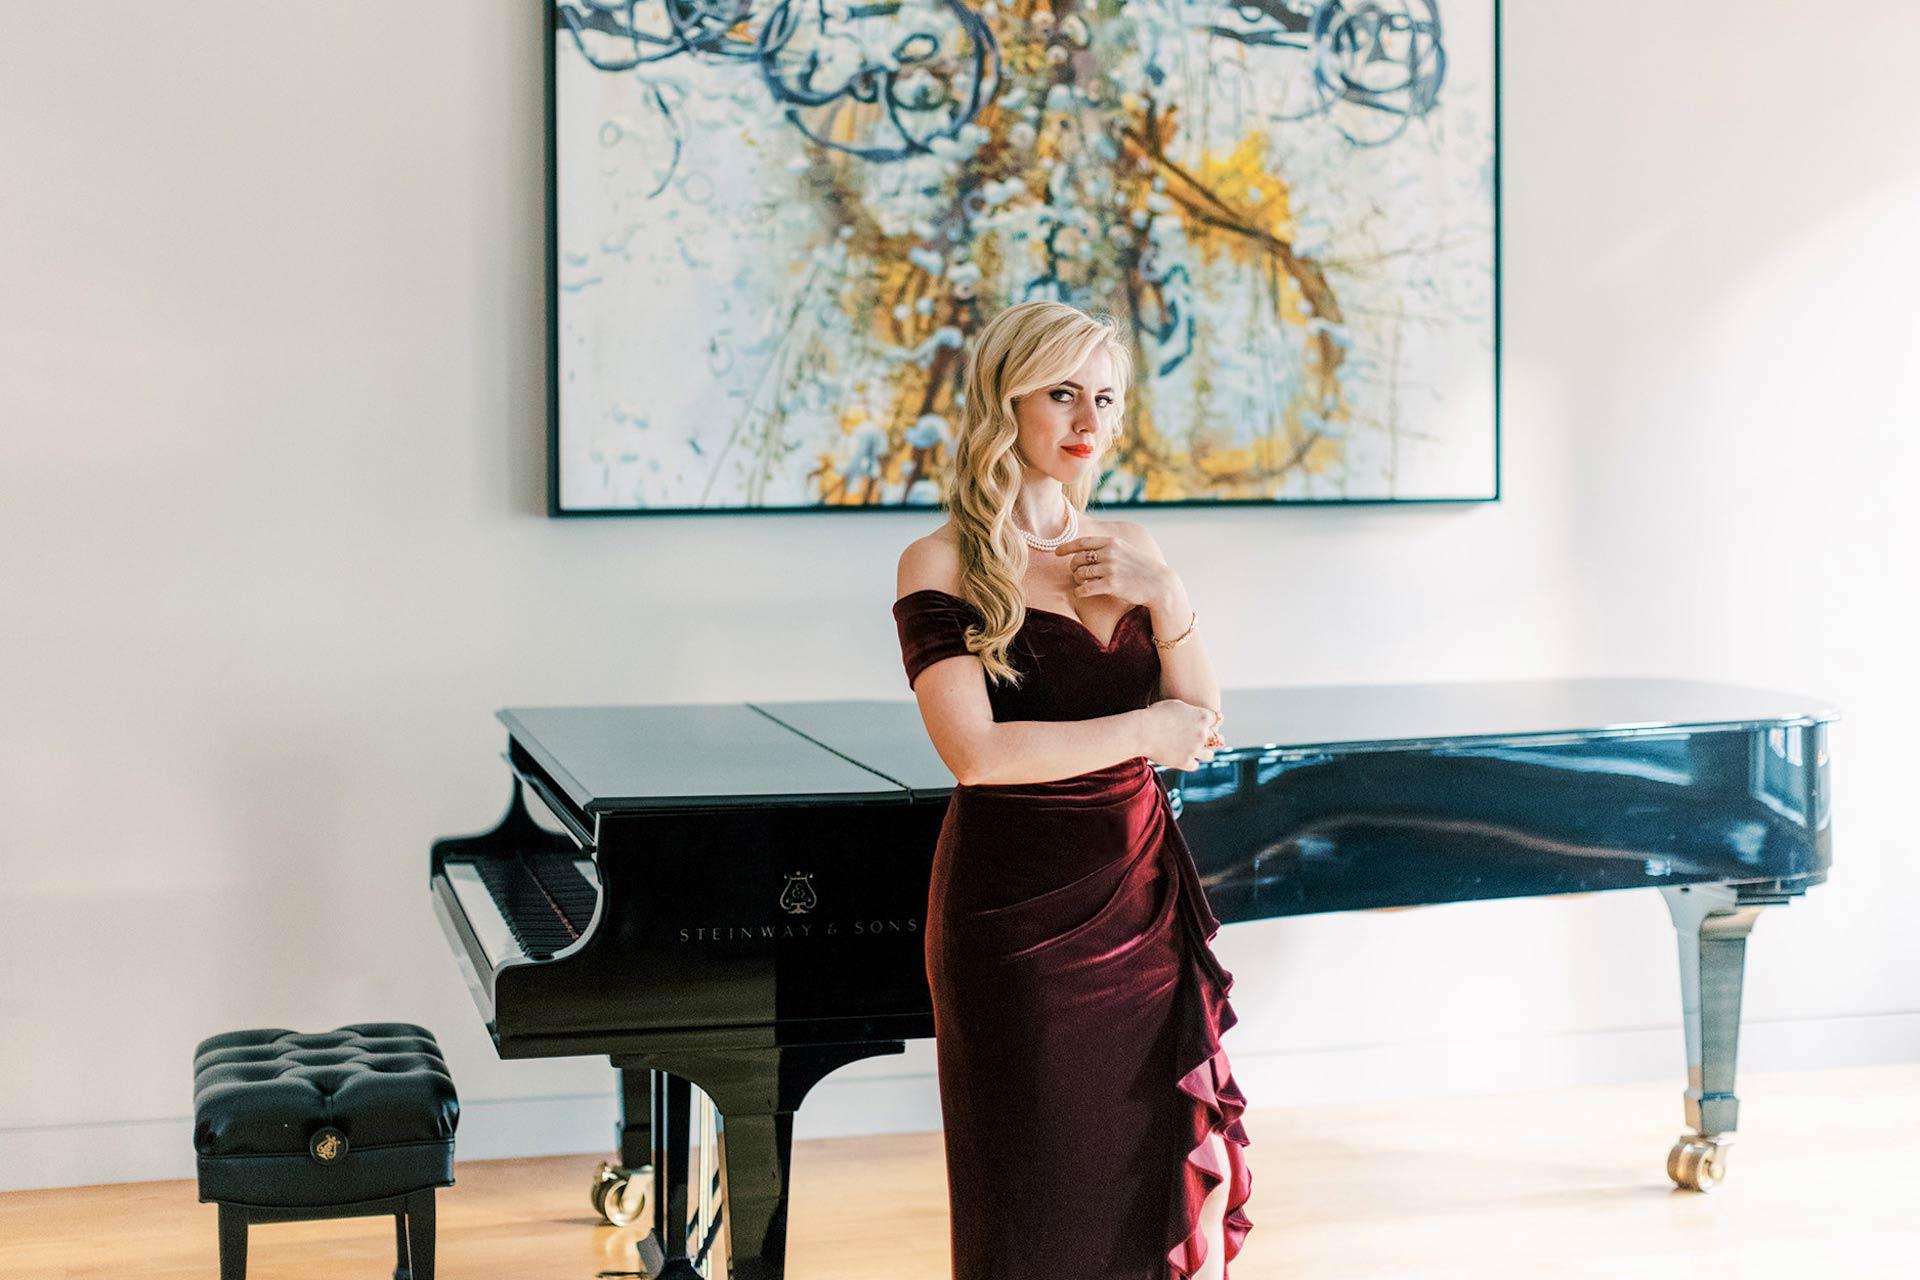 Natasha Paremski Named Artistic Director of the New York Piano Society